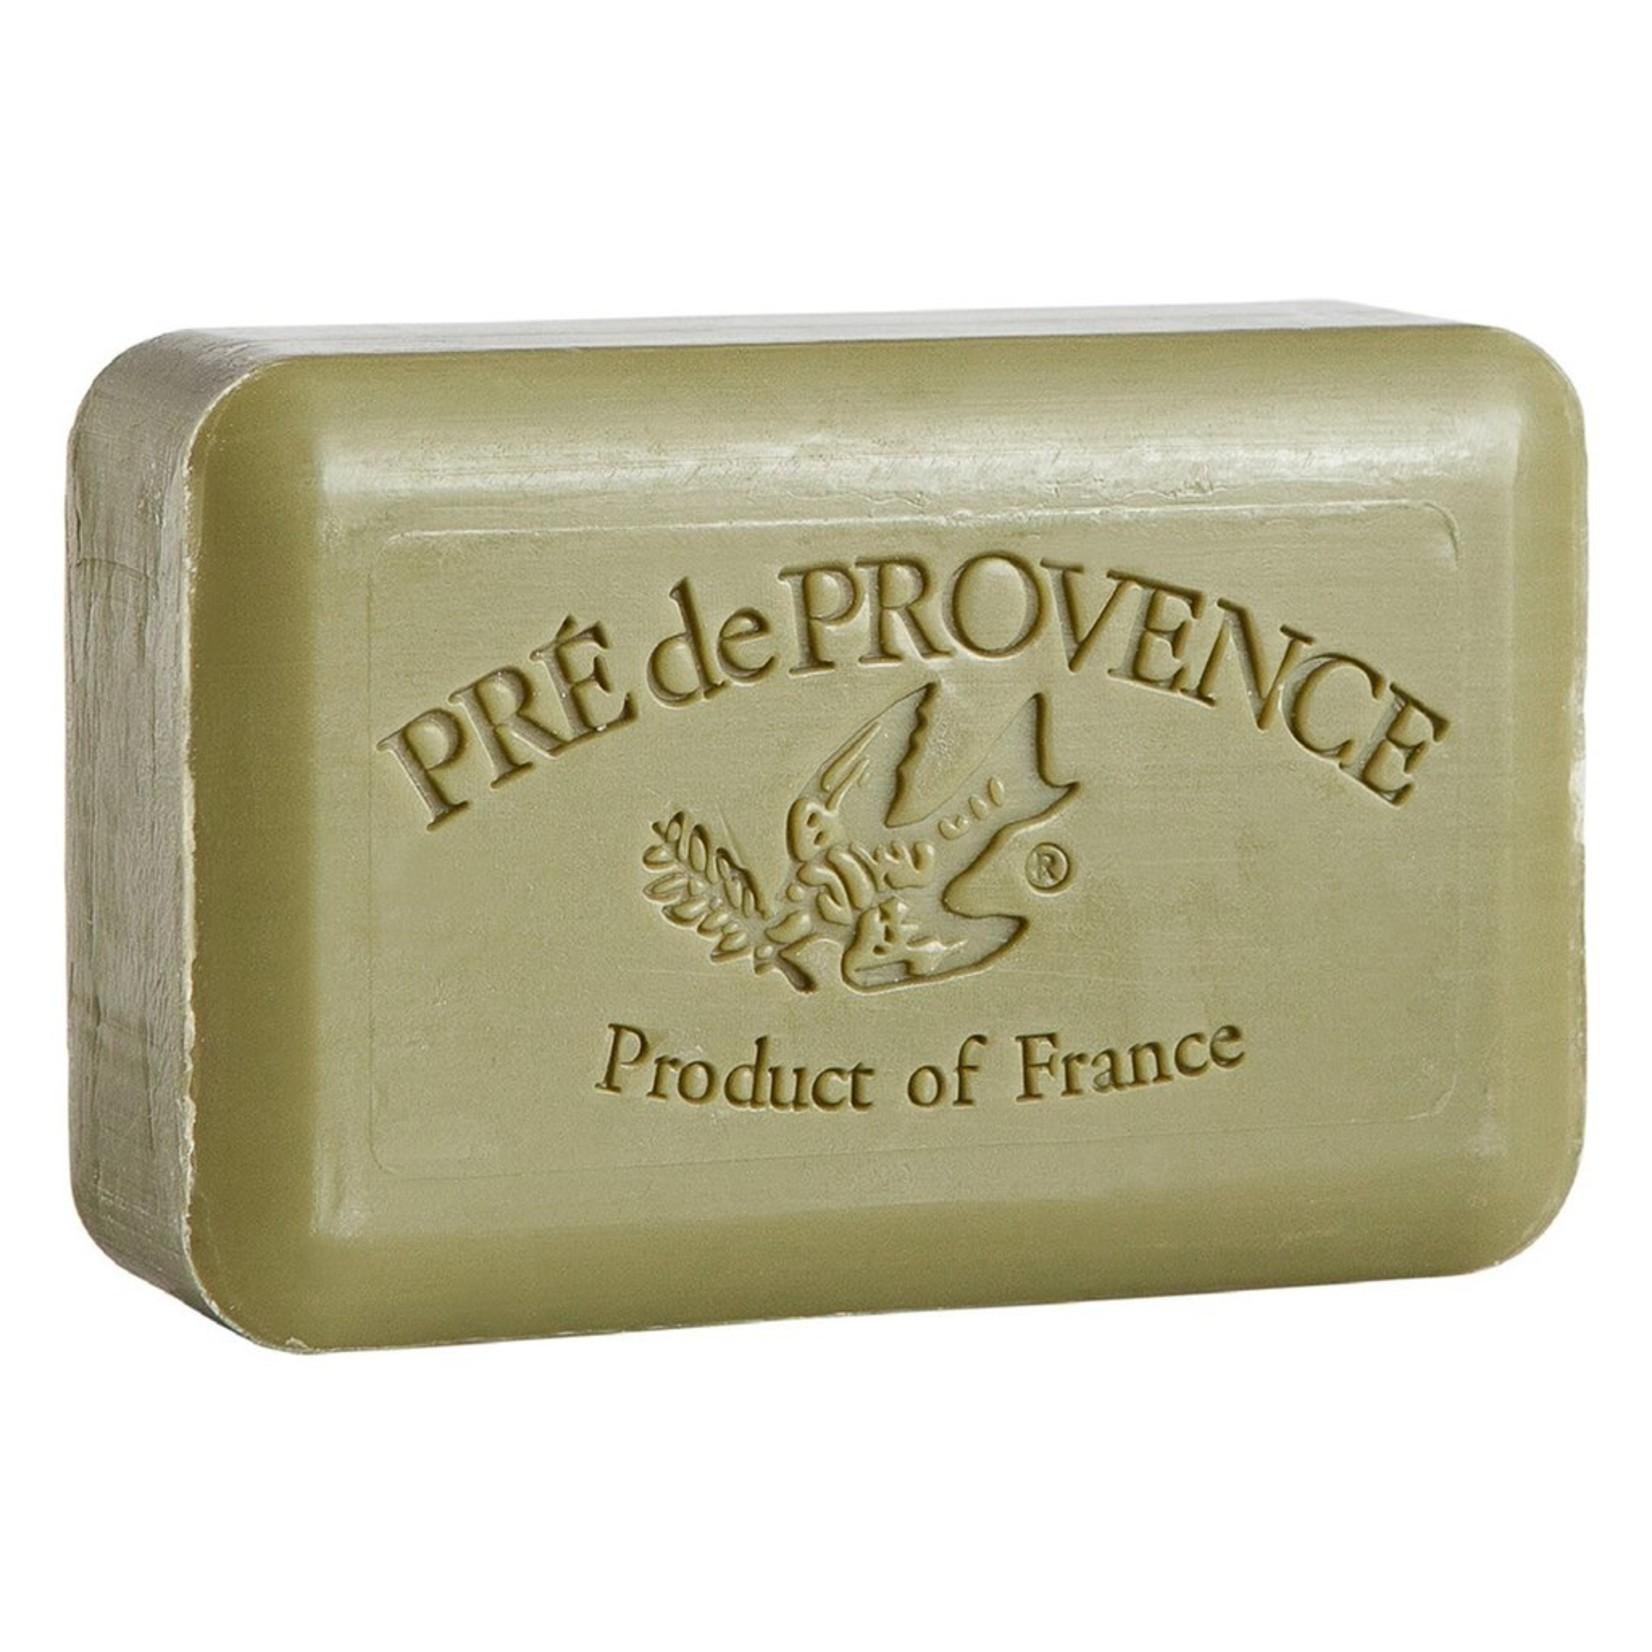 Pre de Provence Marseille Olive Oil Soap Bar - 72%